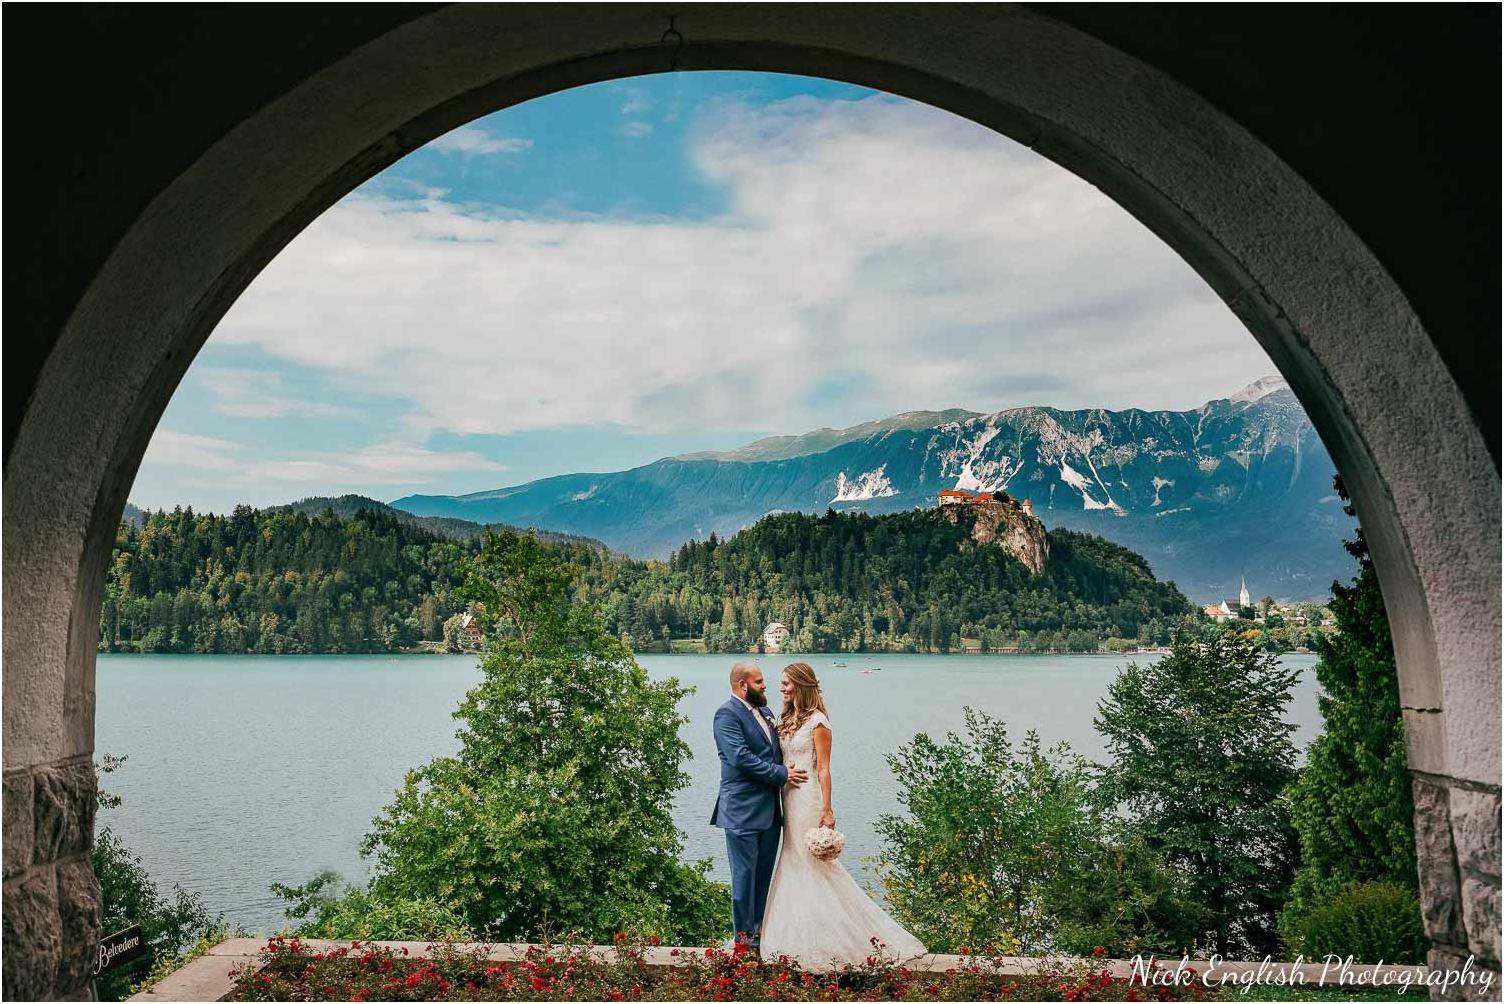 Destination_Wedding_Photographer_Slovenia_Nick_English_Photography-70-1.jpg